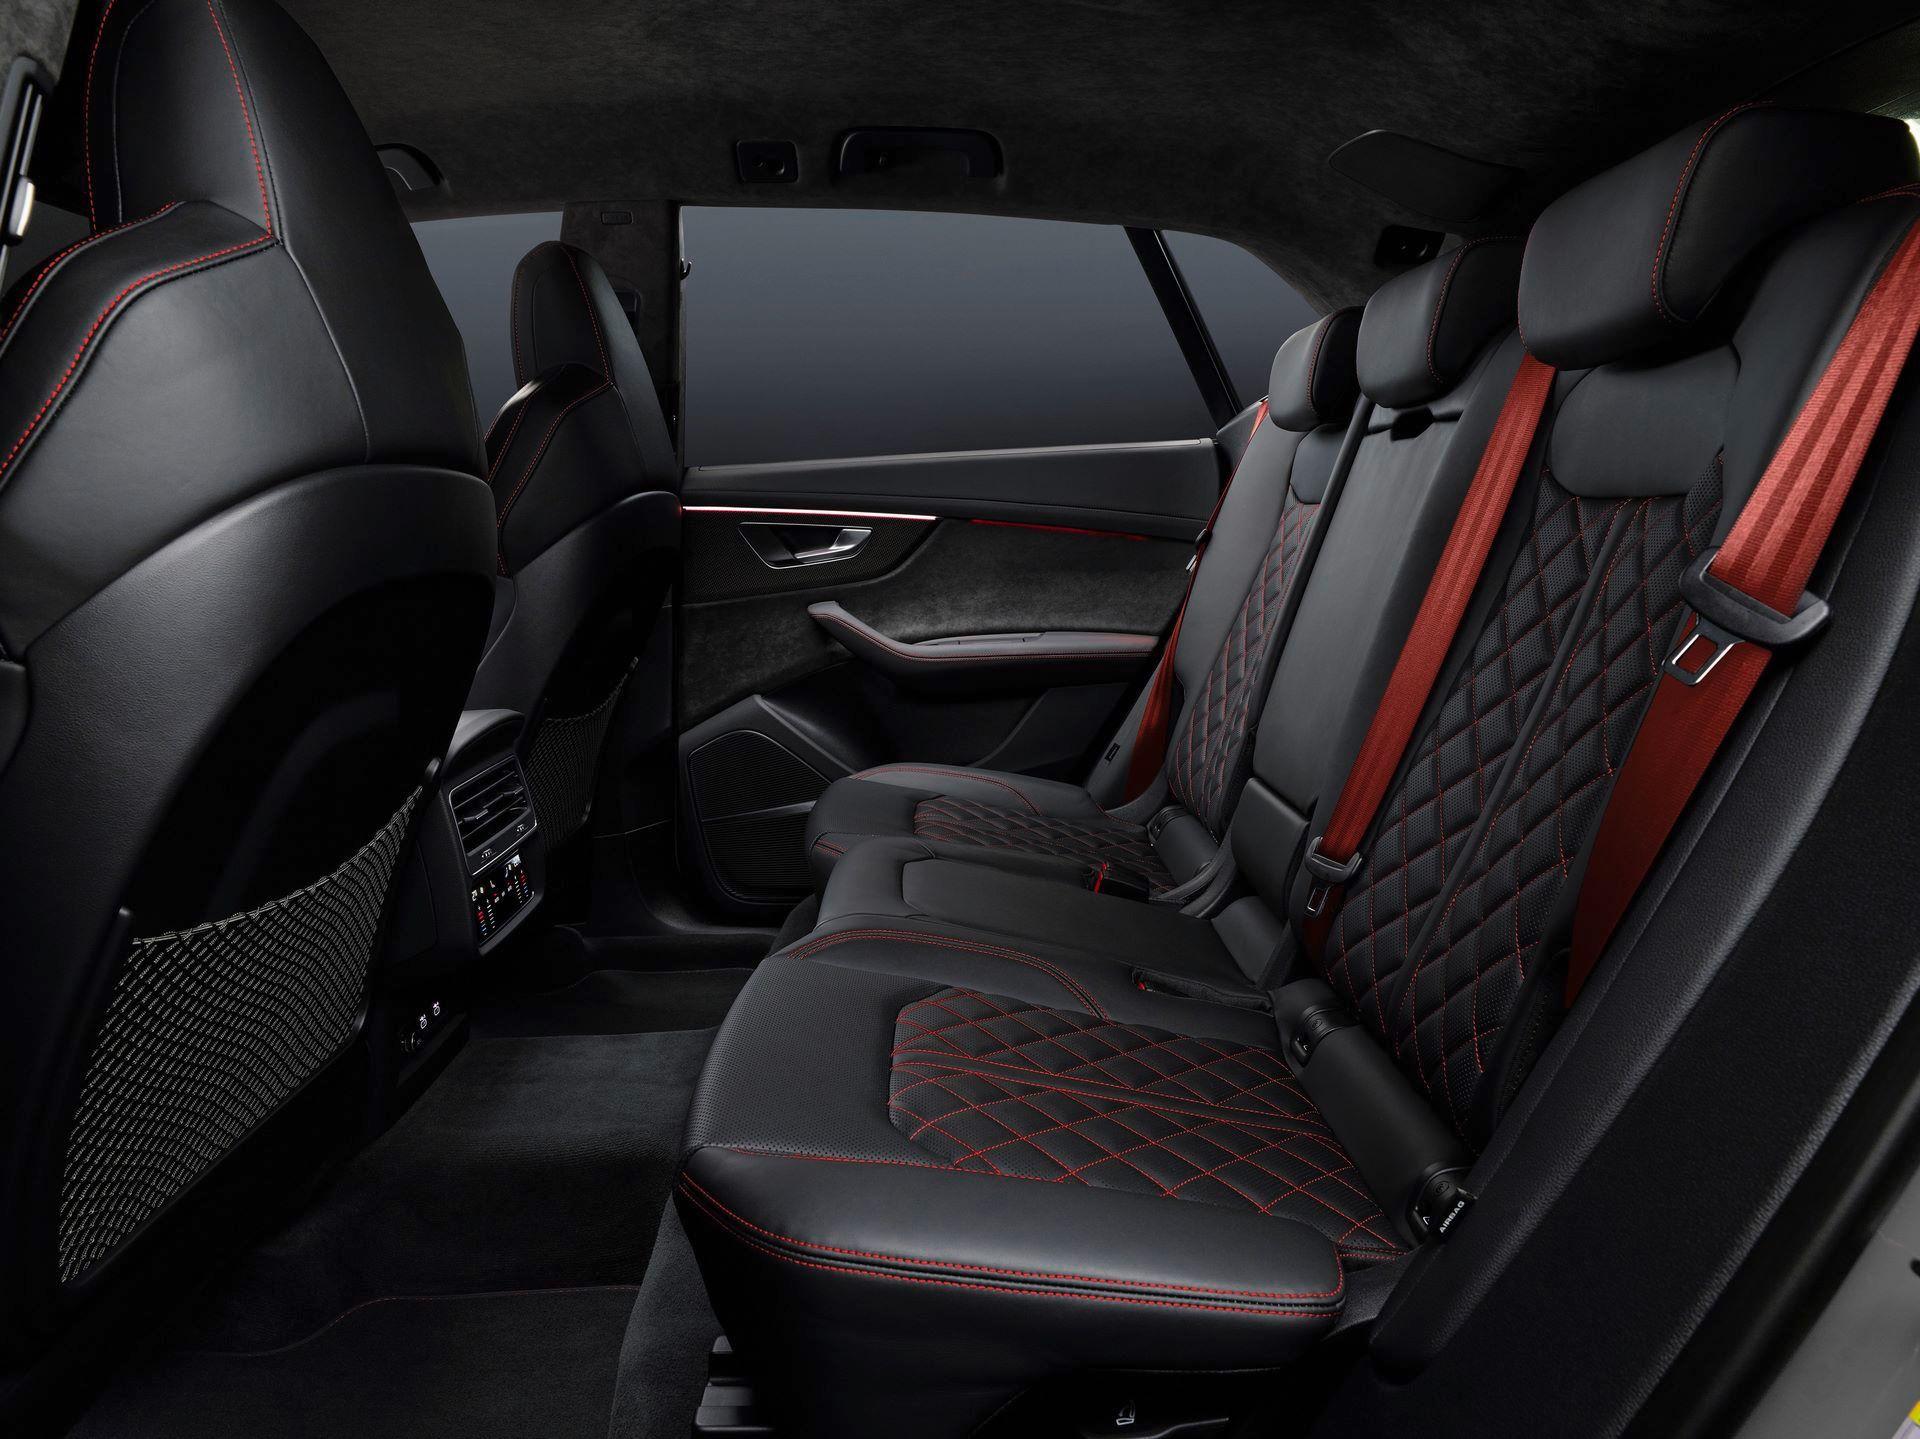 Audi-A4-A5-Q7-Q8-Competition-And-Competition-Plus-Trims-32